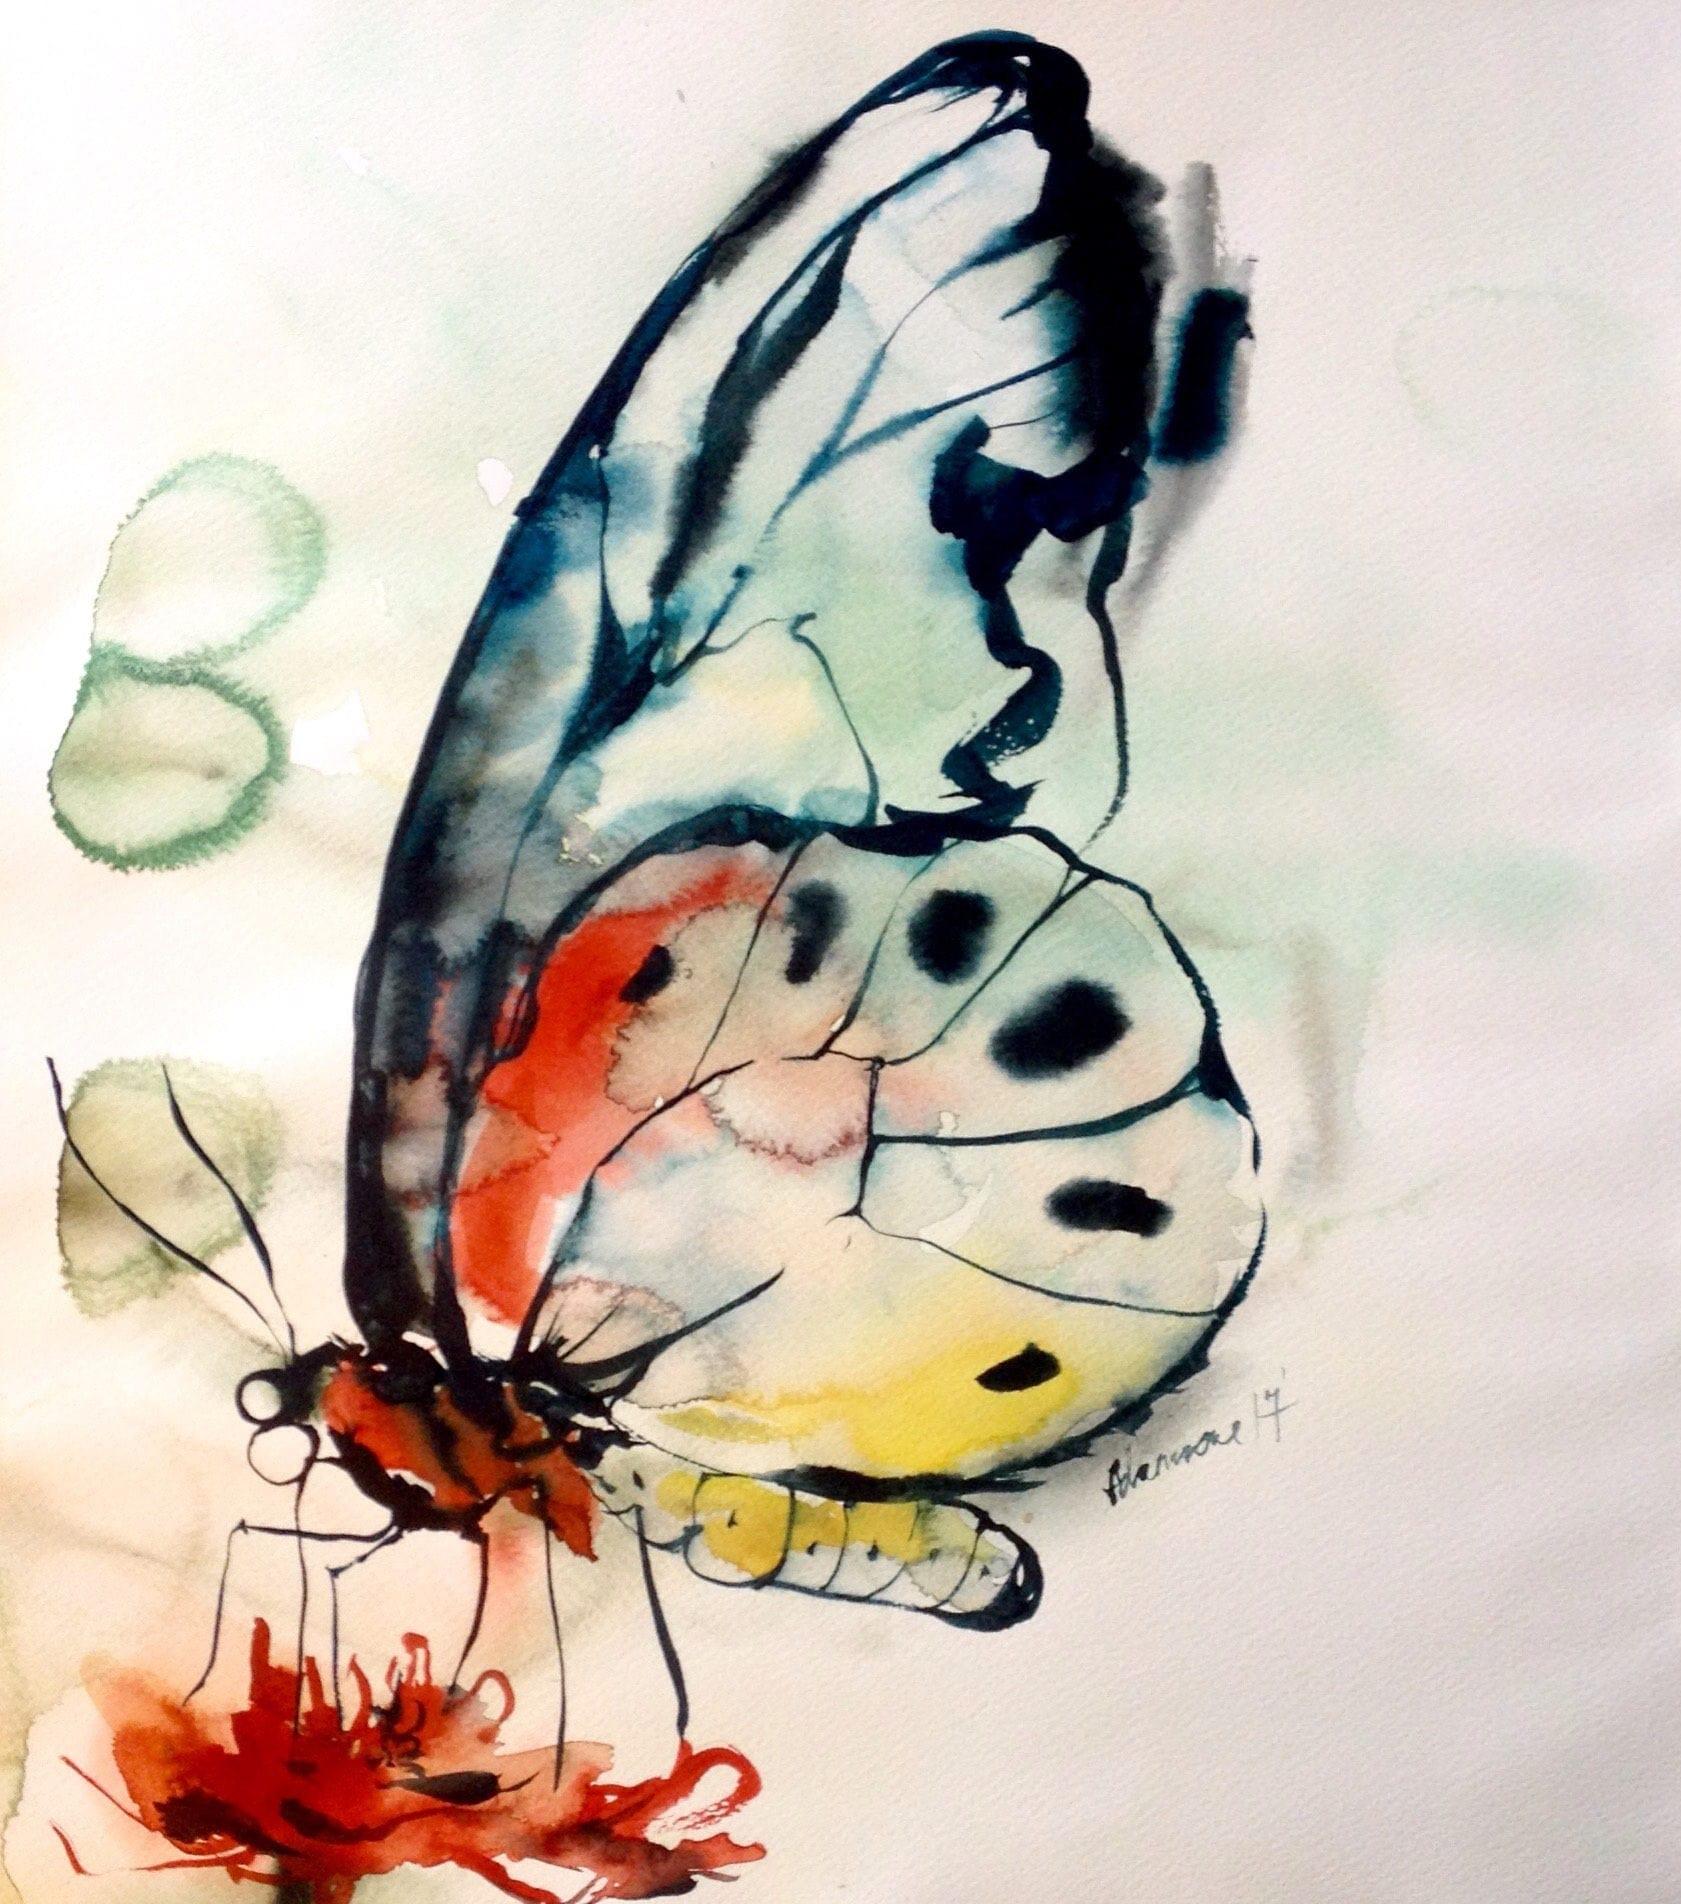 Butterfly watercolor painting original artwork. Aquarelle